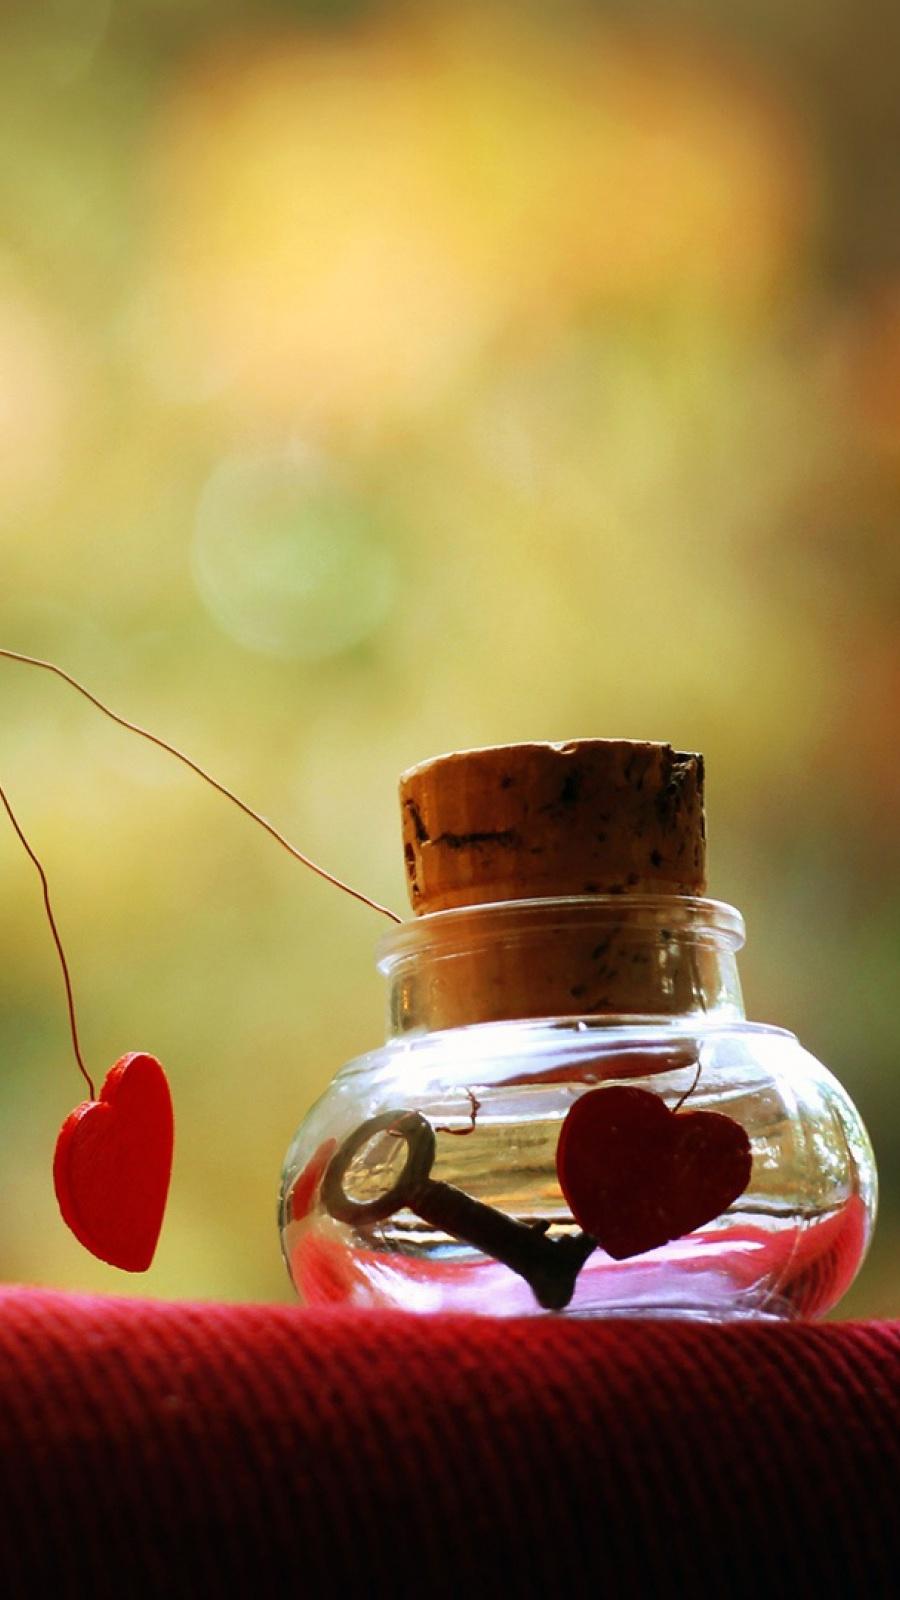 D Love Hd Wallpaper Beautiful Heart Image Heart Background Full